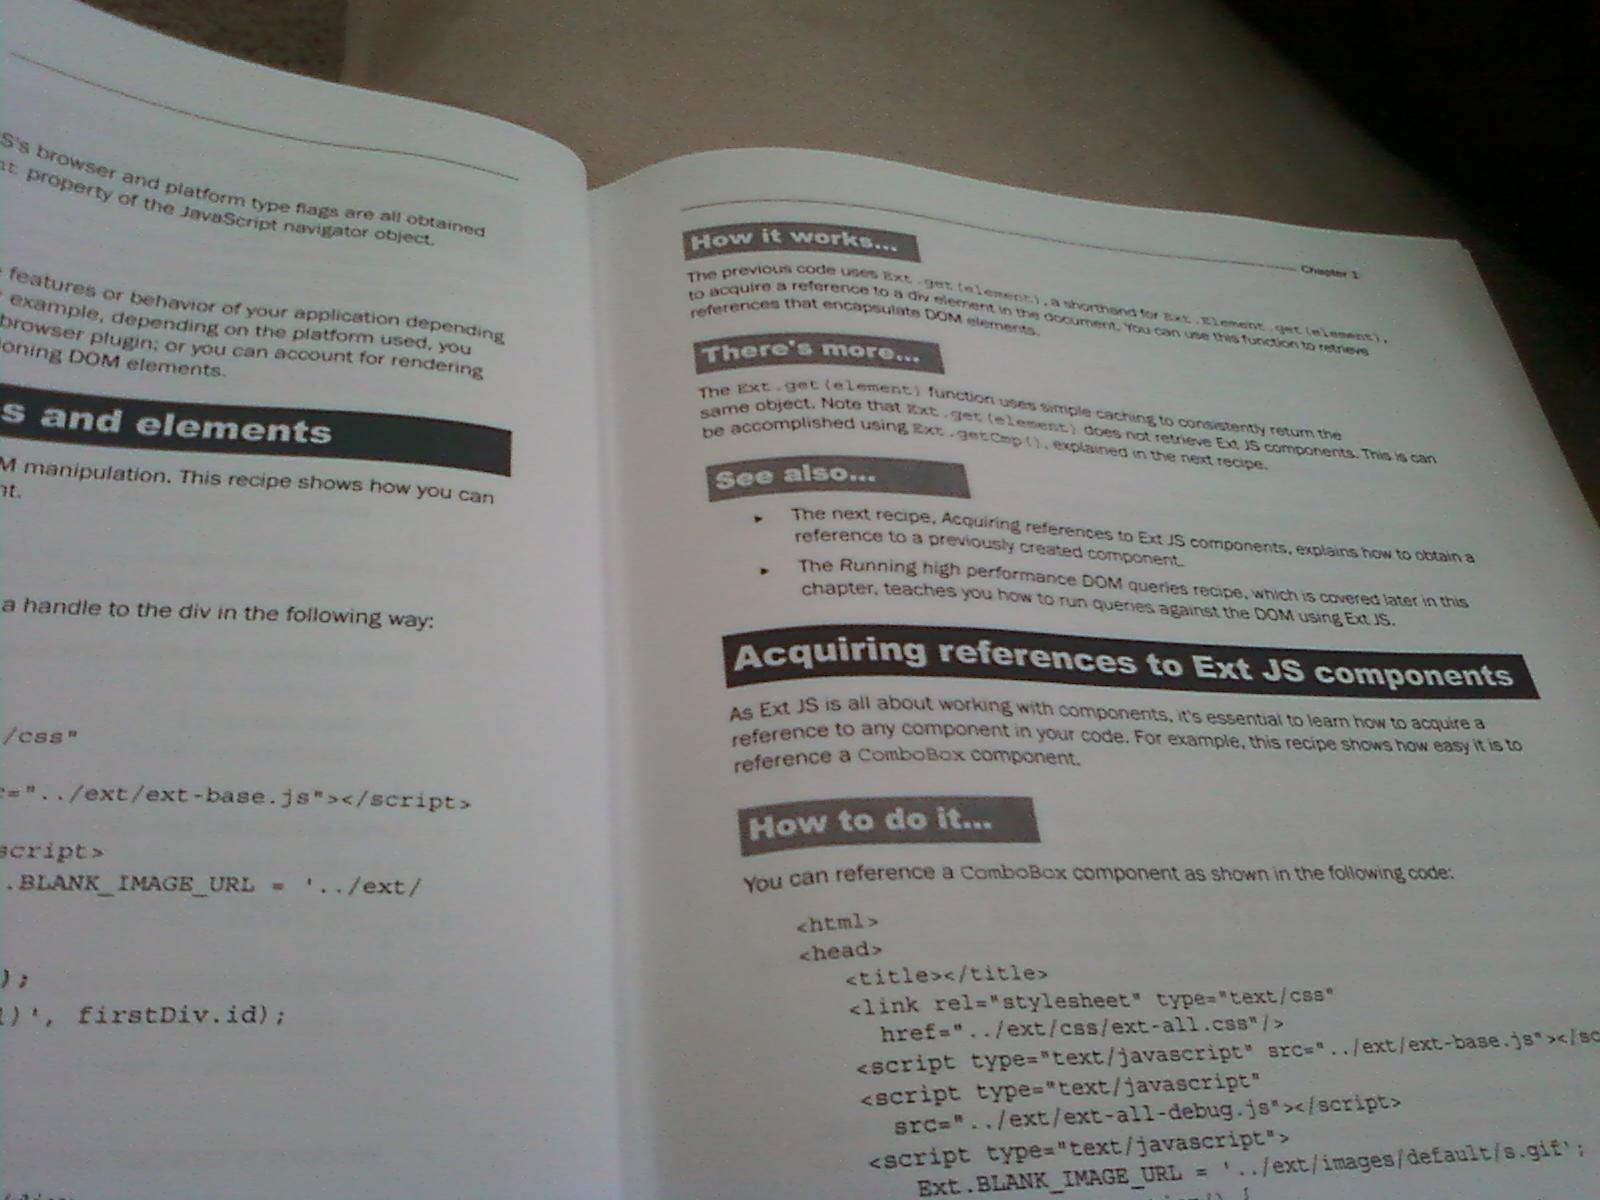 ExtJS 3.0 Cookbook